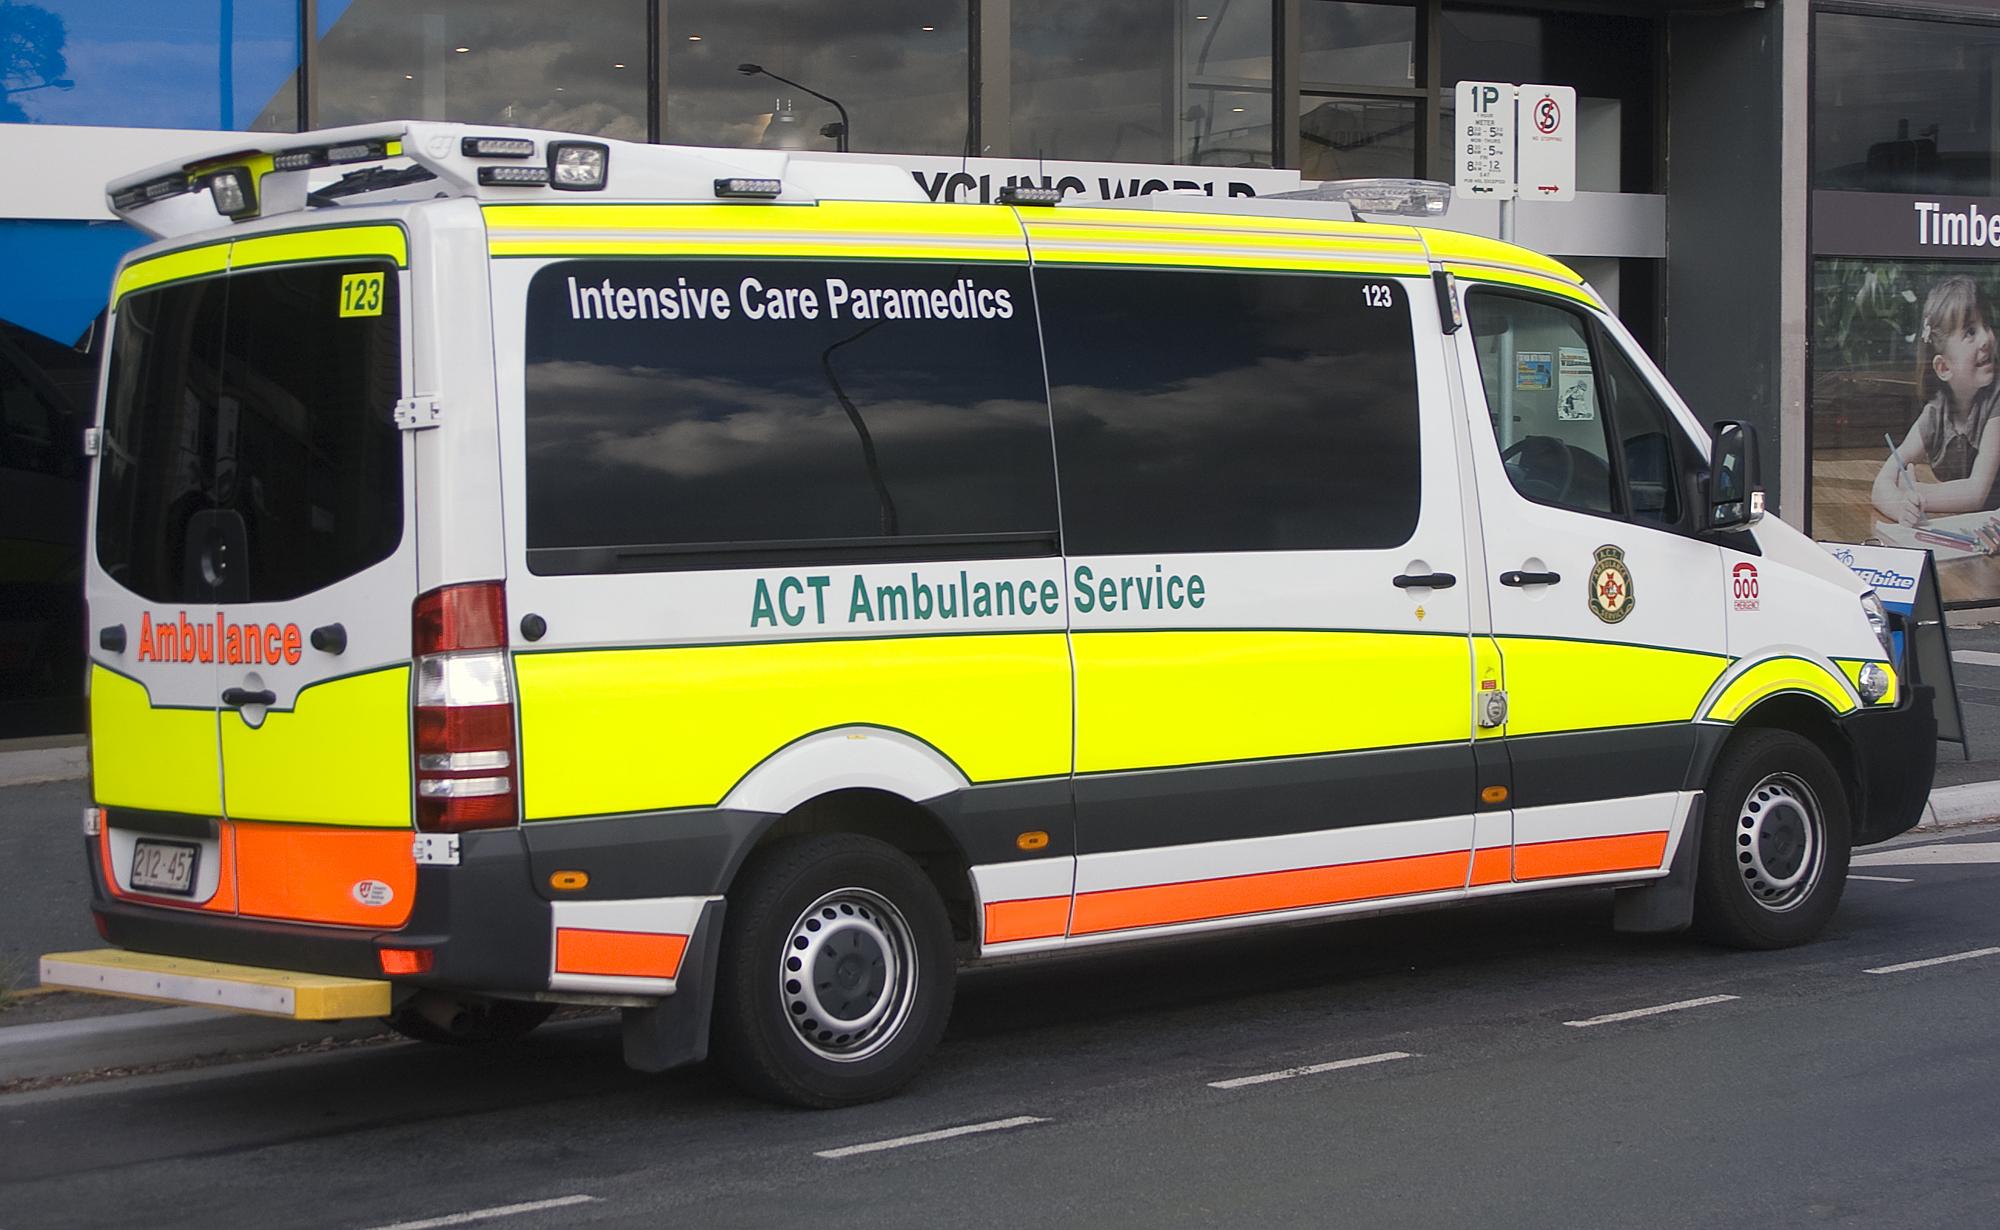 File:Mercedes-Benz Sprinter (ACT Ambulance Service - ICP) 2.jpg